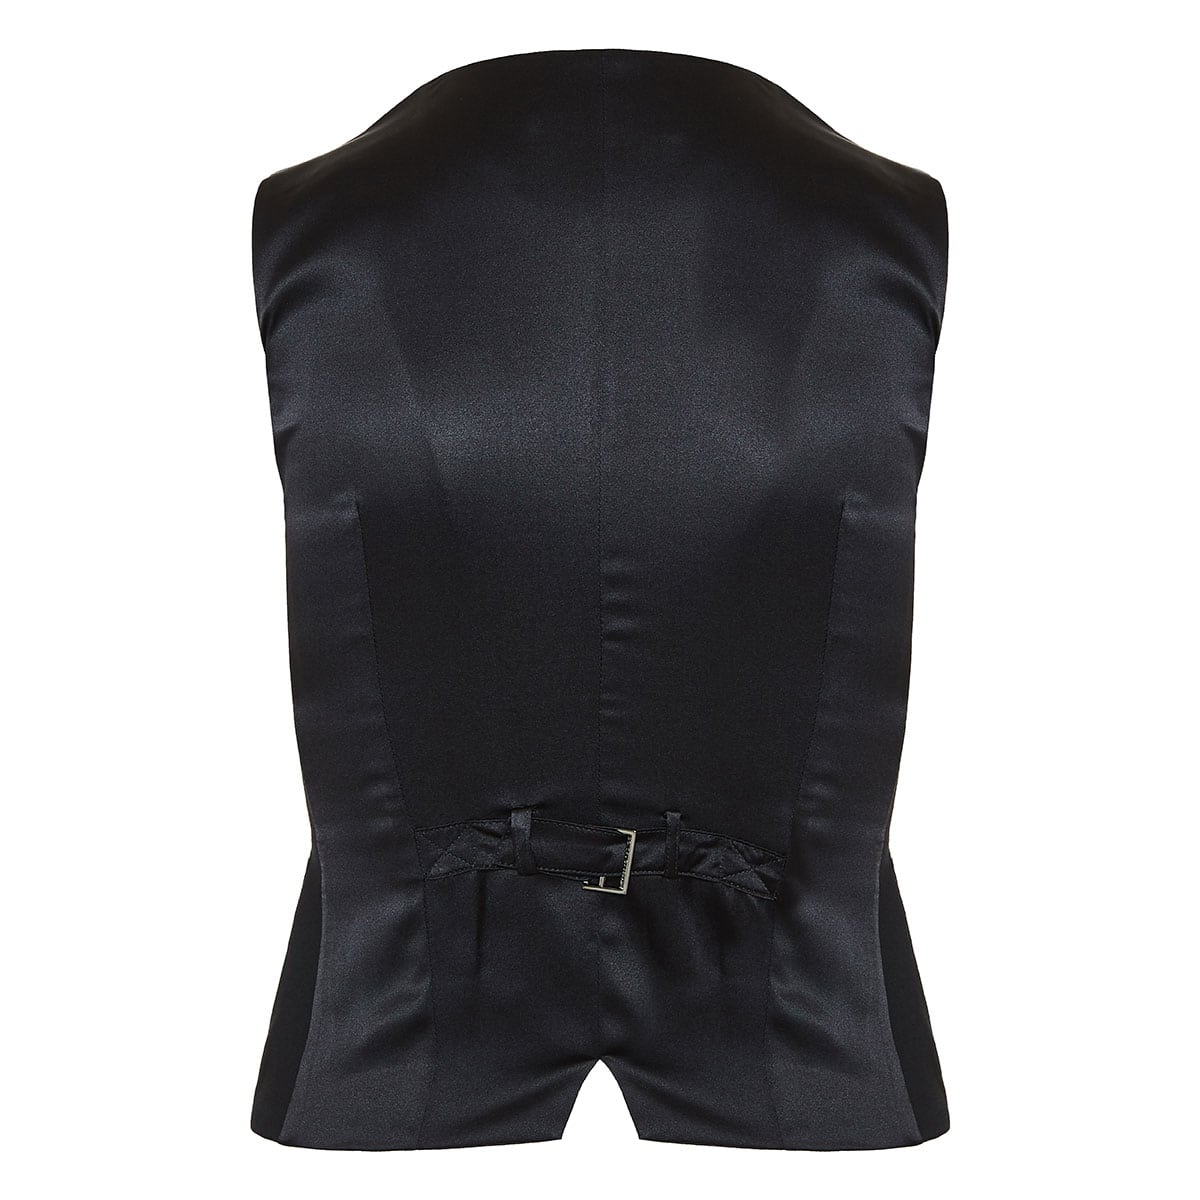 Double-breasted tuxedo vest